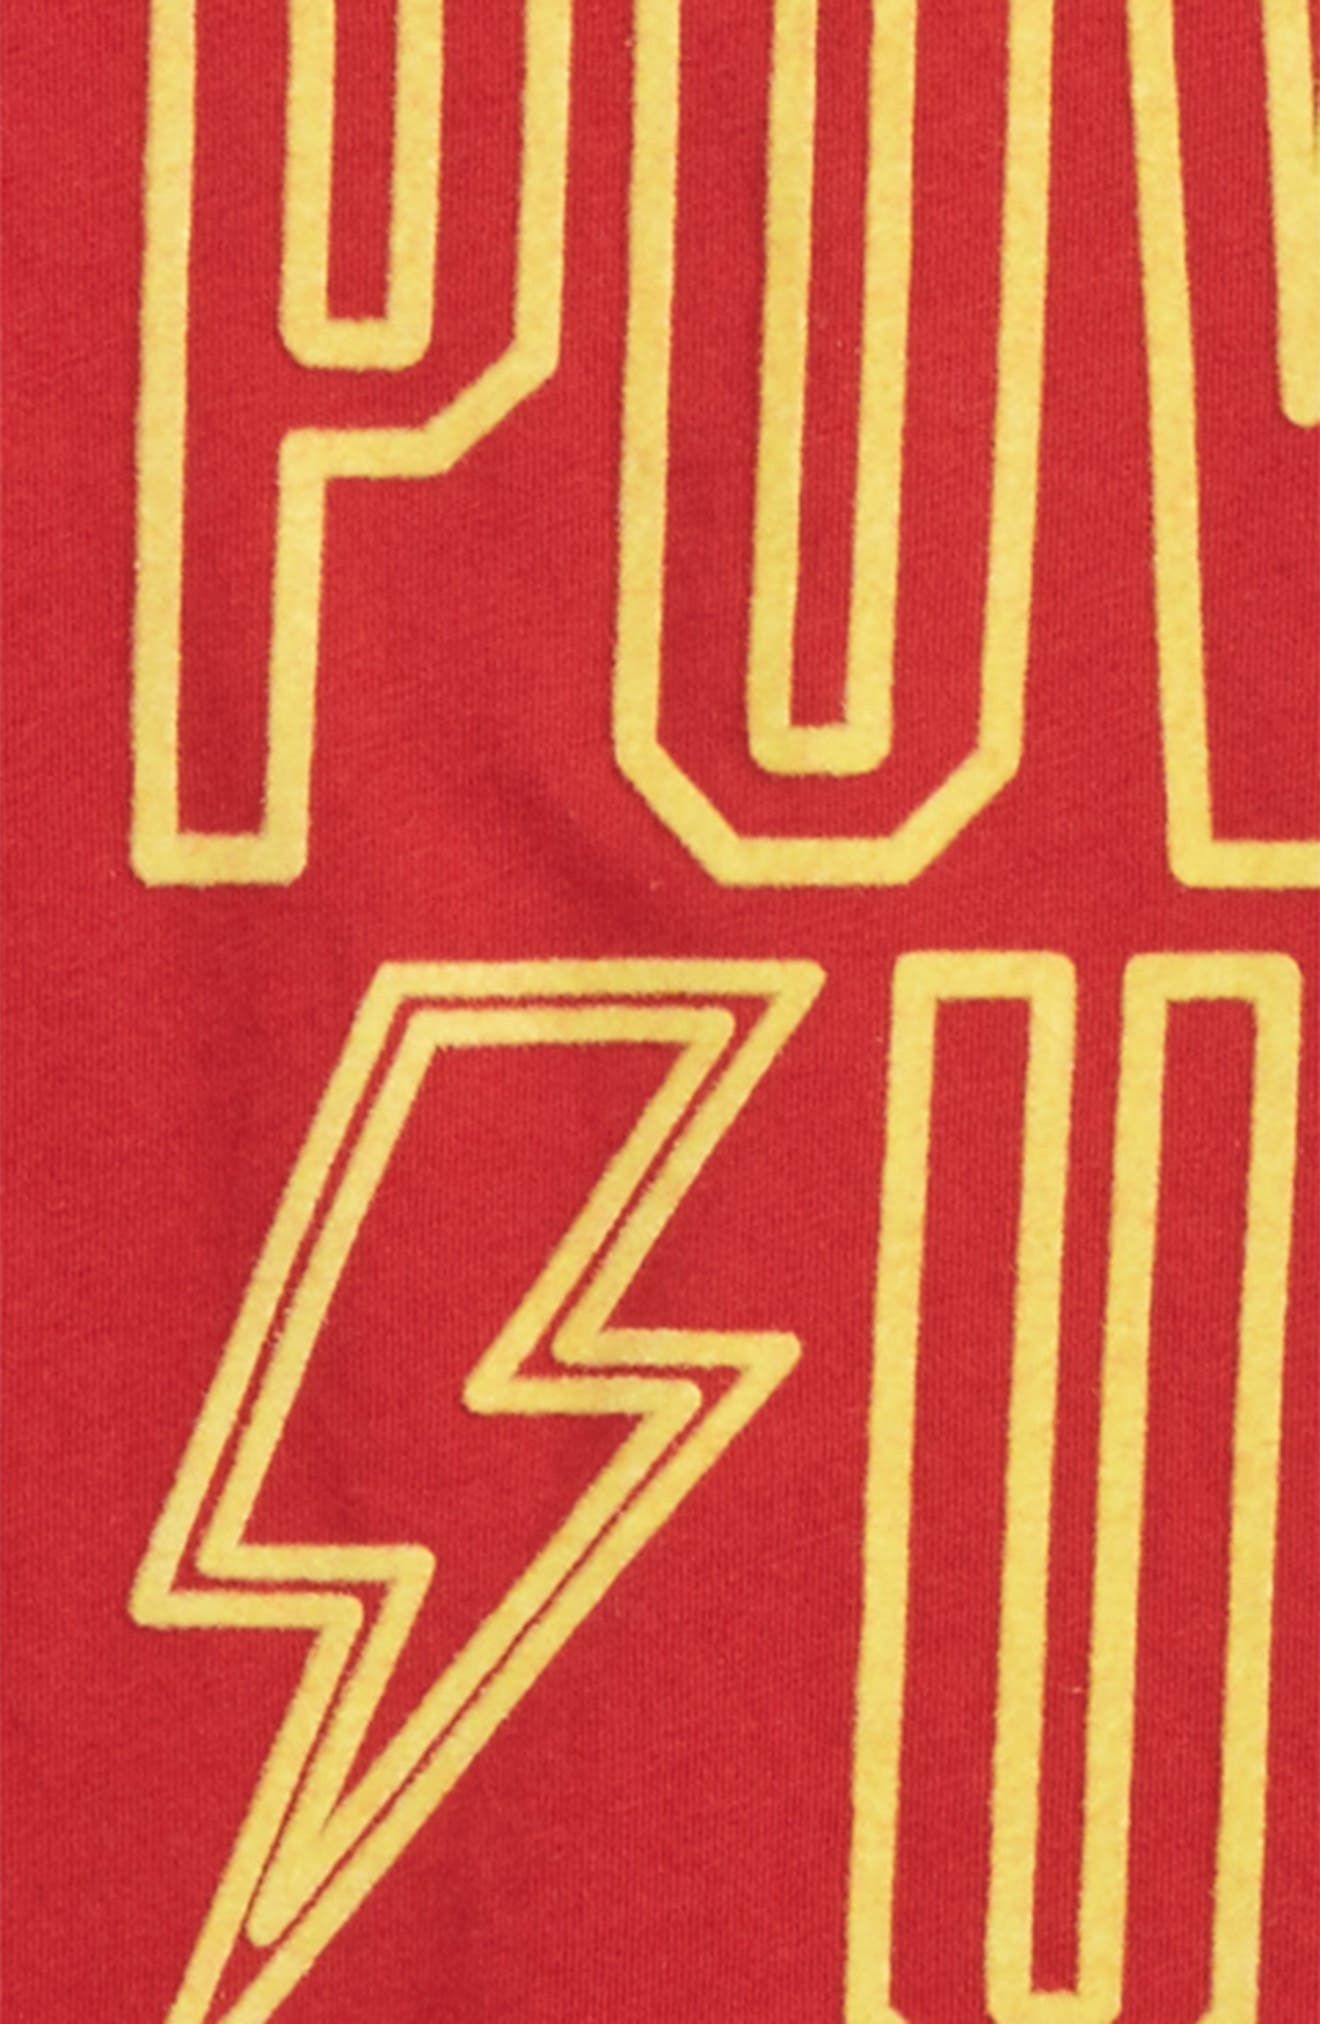 Power Up T-Shirt,                             Alternate thumbnail 3, color,                             600